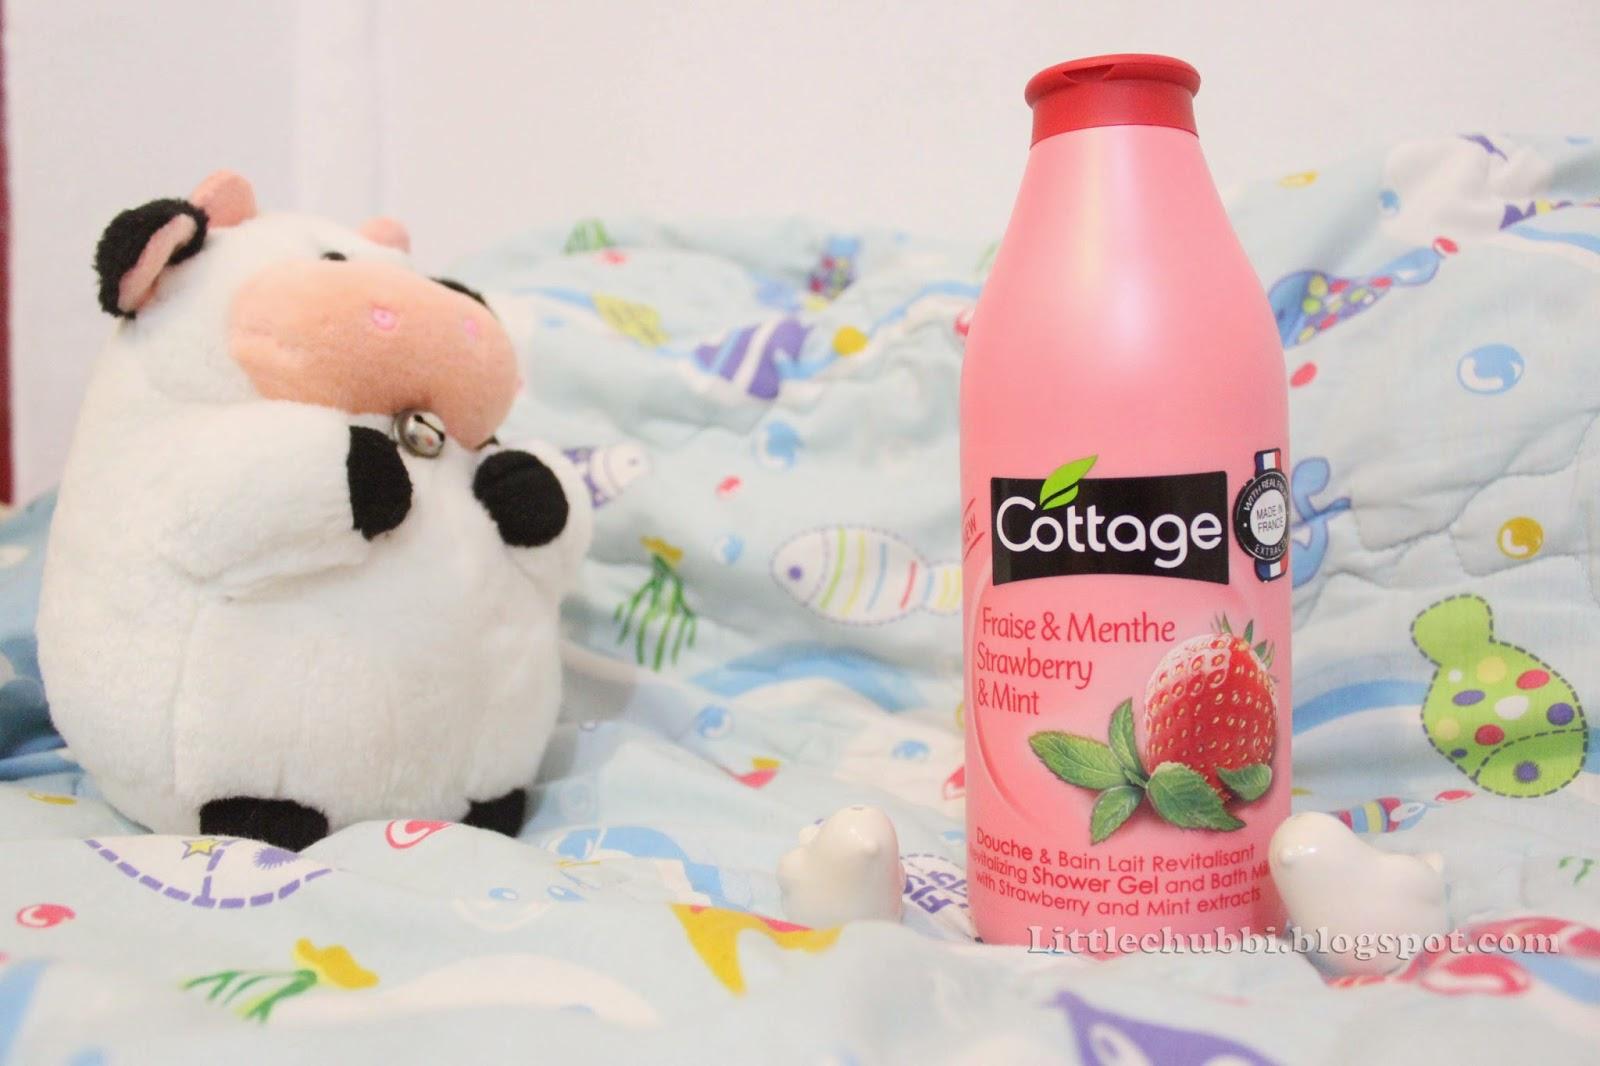 Info Harga Cottage Shower Gel And Bath Milk 750 Ml Update 2018 Lee Cooper Lc37gd Jam Tangan Pria Cokelat Littlechubbi Revitalizing Strawberry Mint